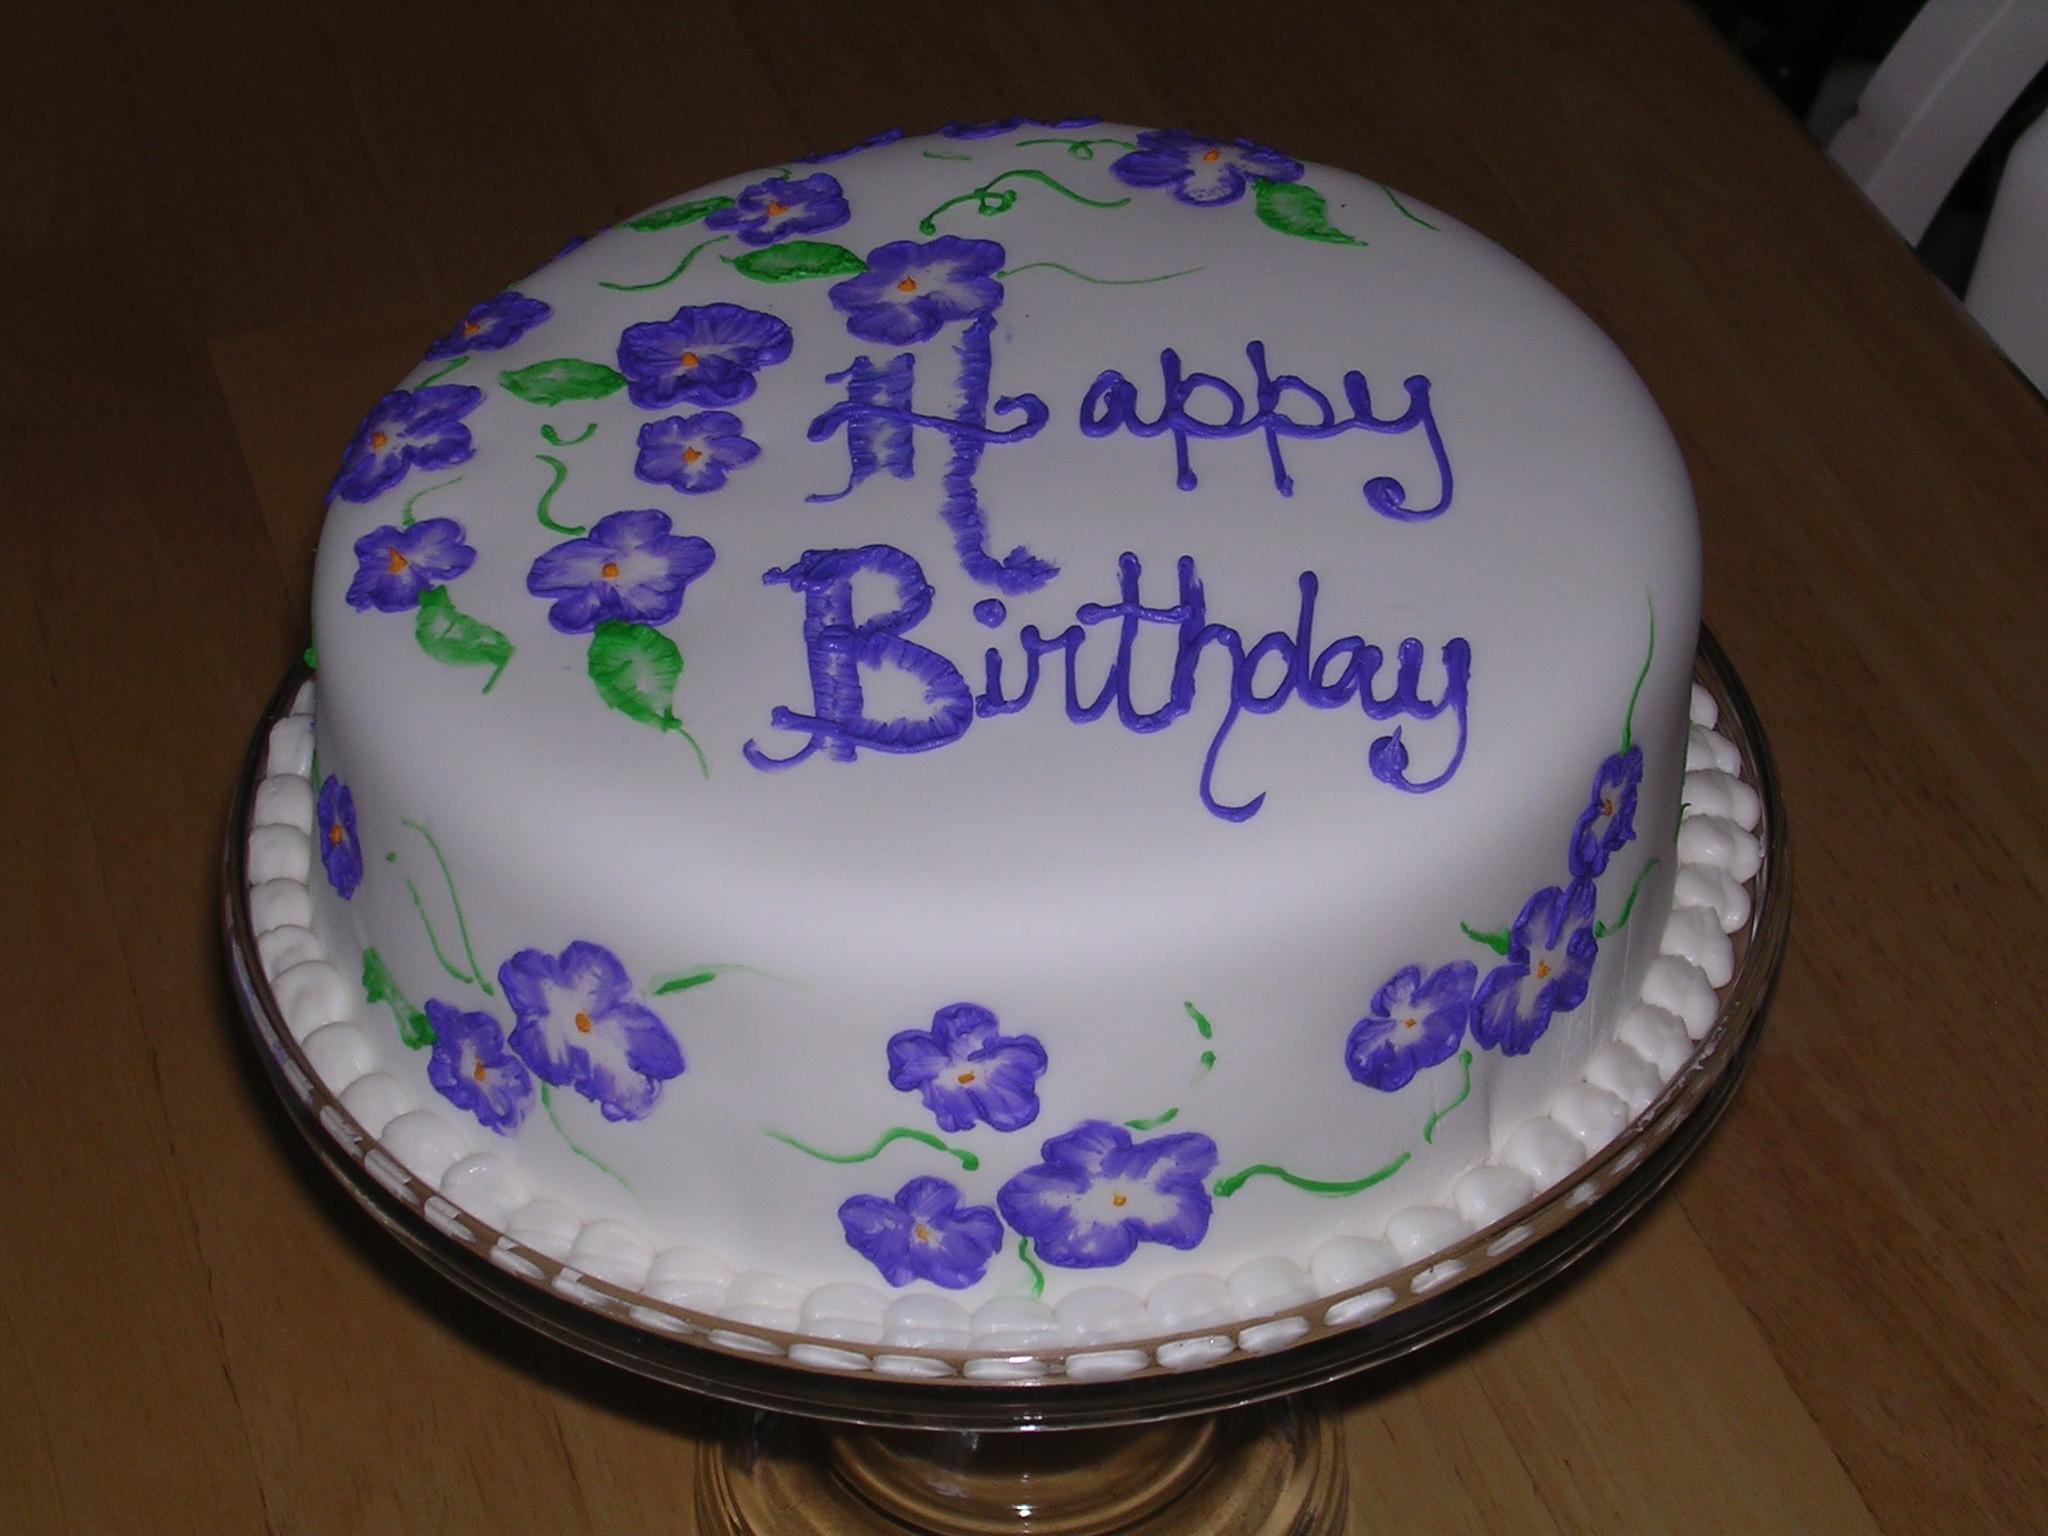 Boys birthday cakes free wallpaper Brushed Flower Birthday Cake